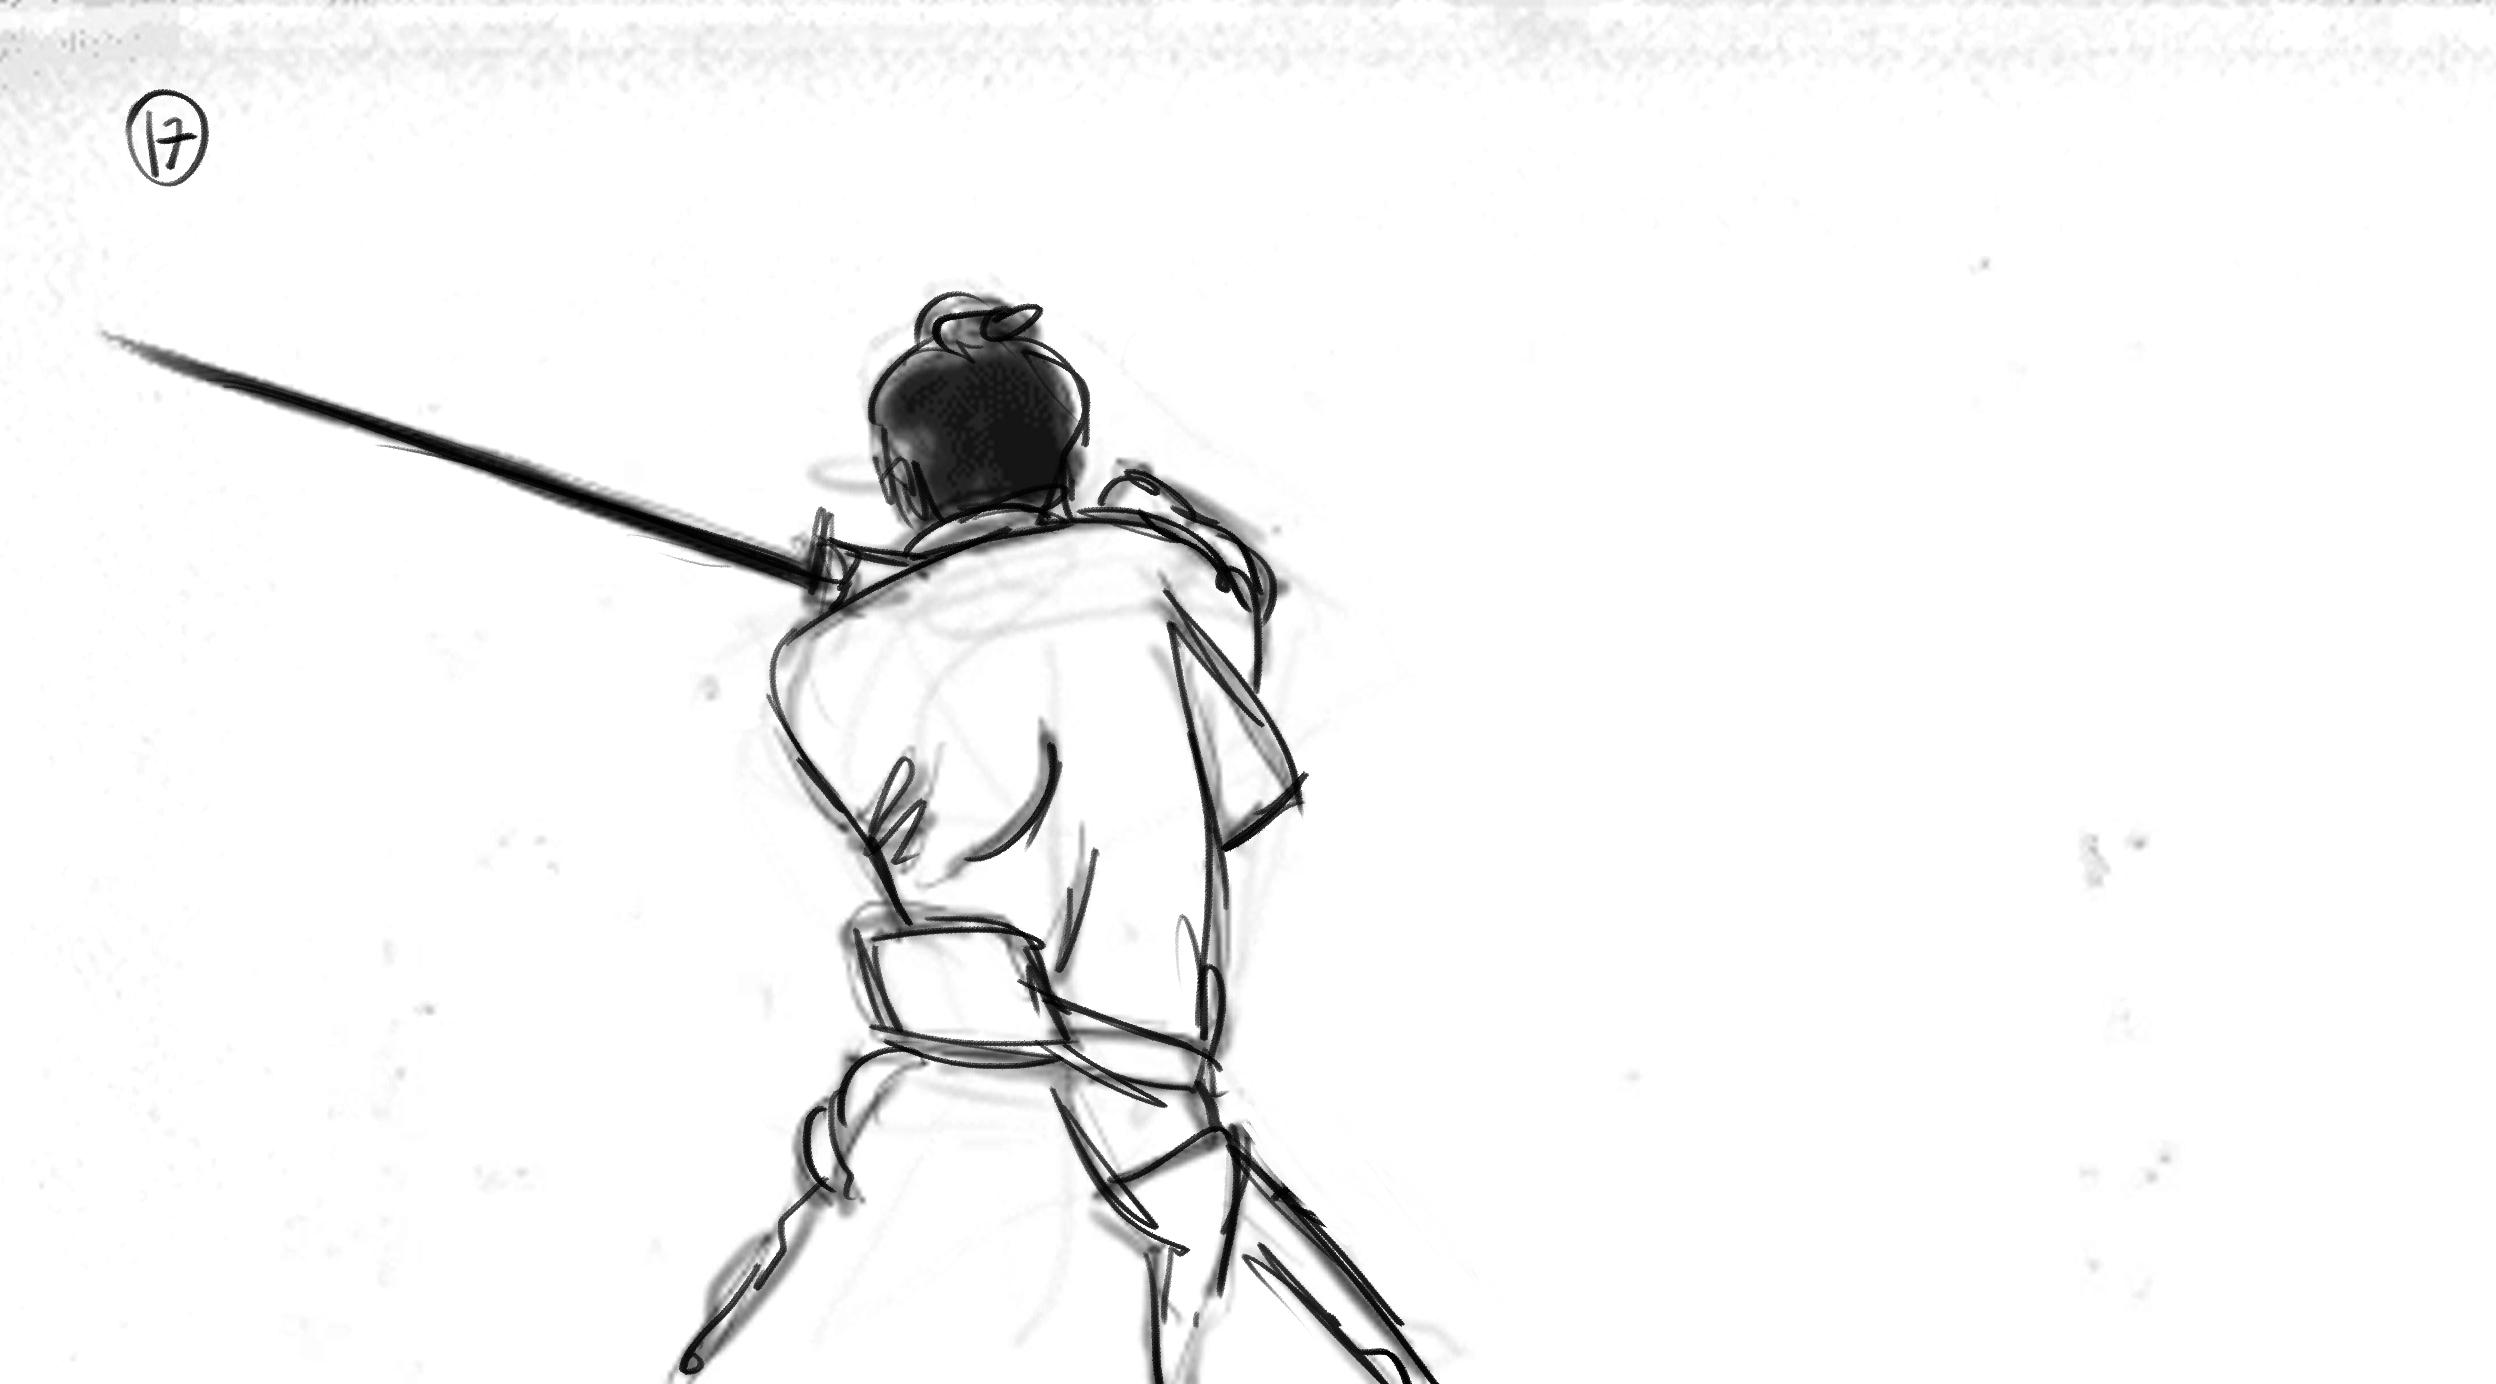 http://www.joachimloesener.com/wp-content/uploads/2018/10/samurai.mp4